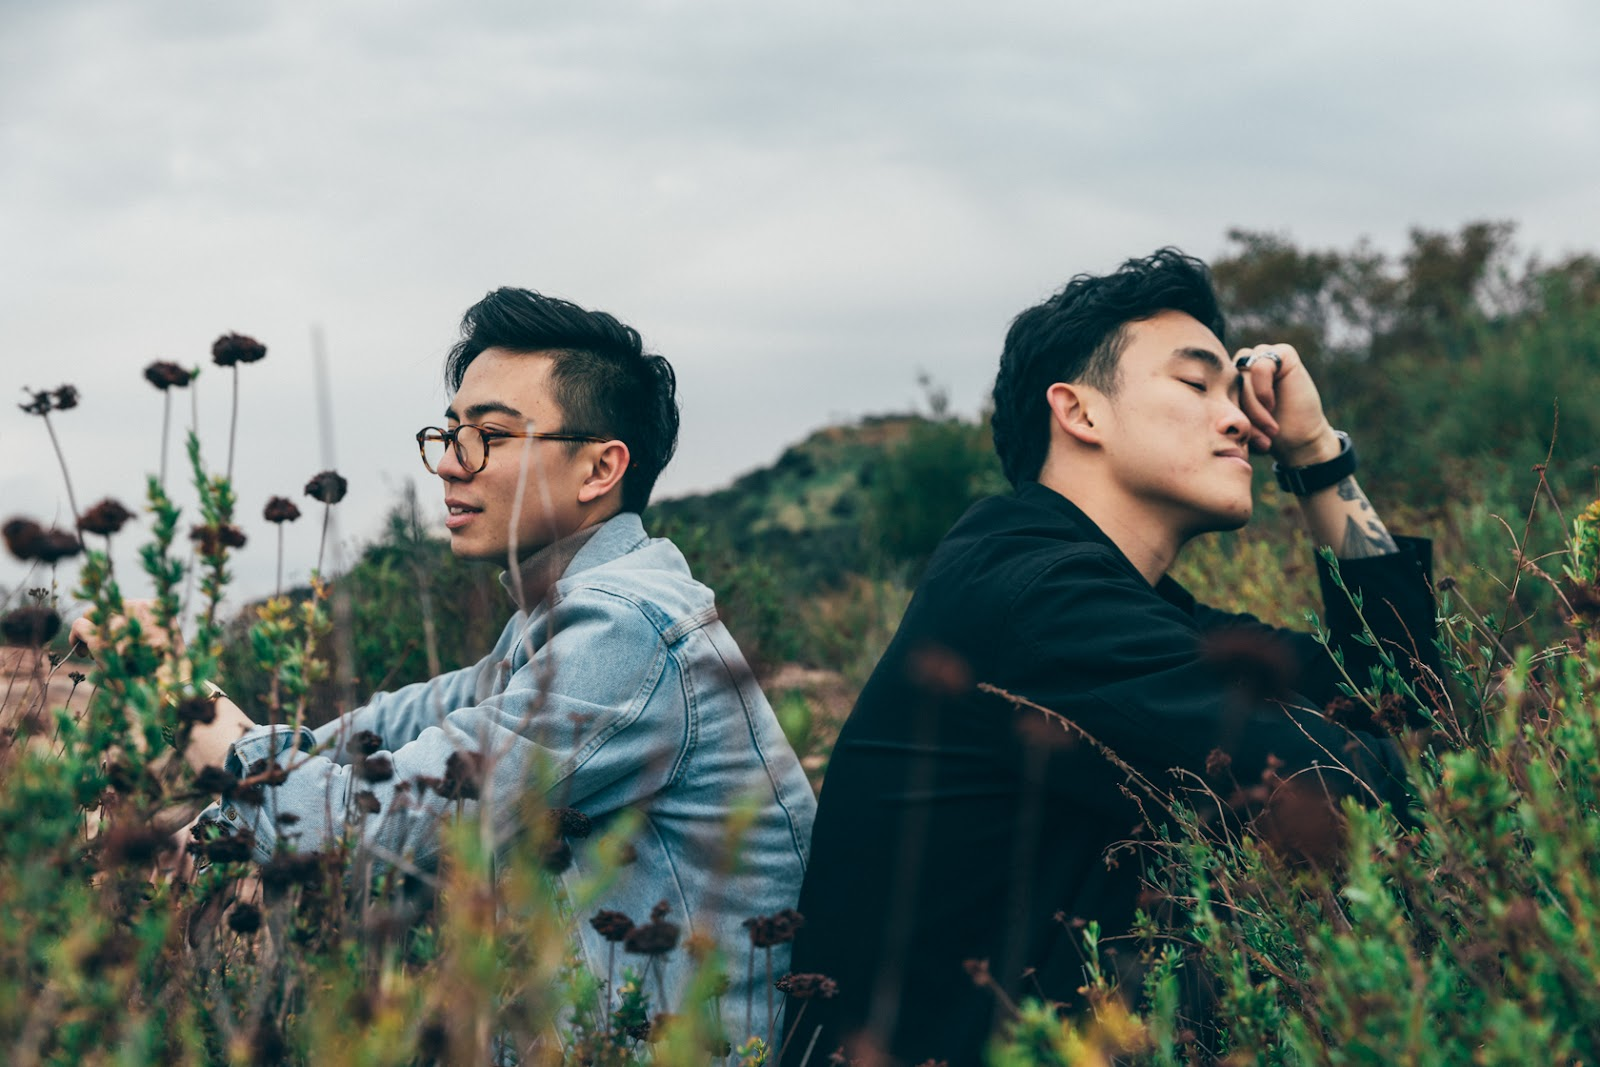 MYRNE & Manila Killa Team Up to Release Fluorescence EP